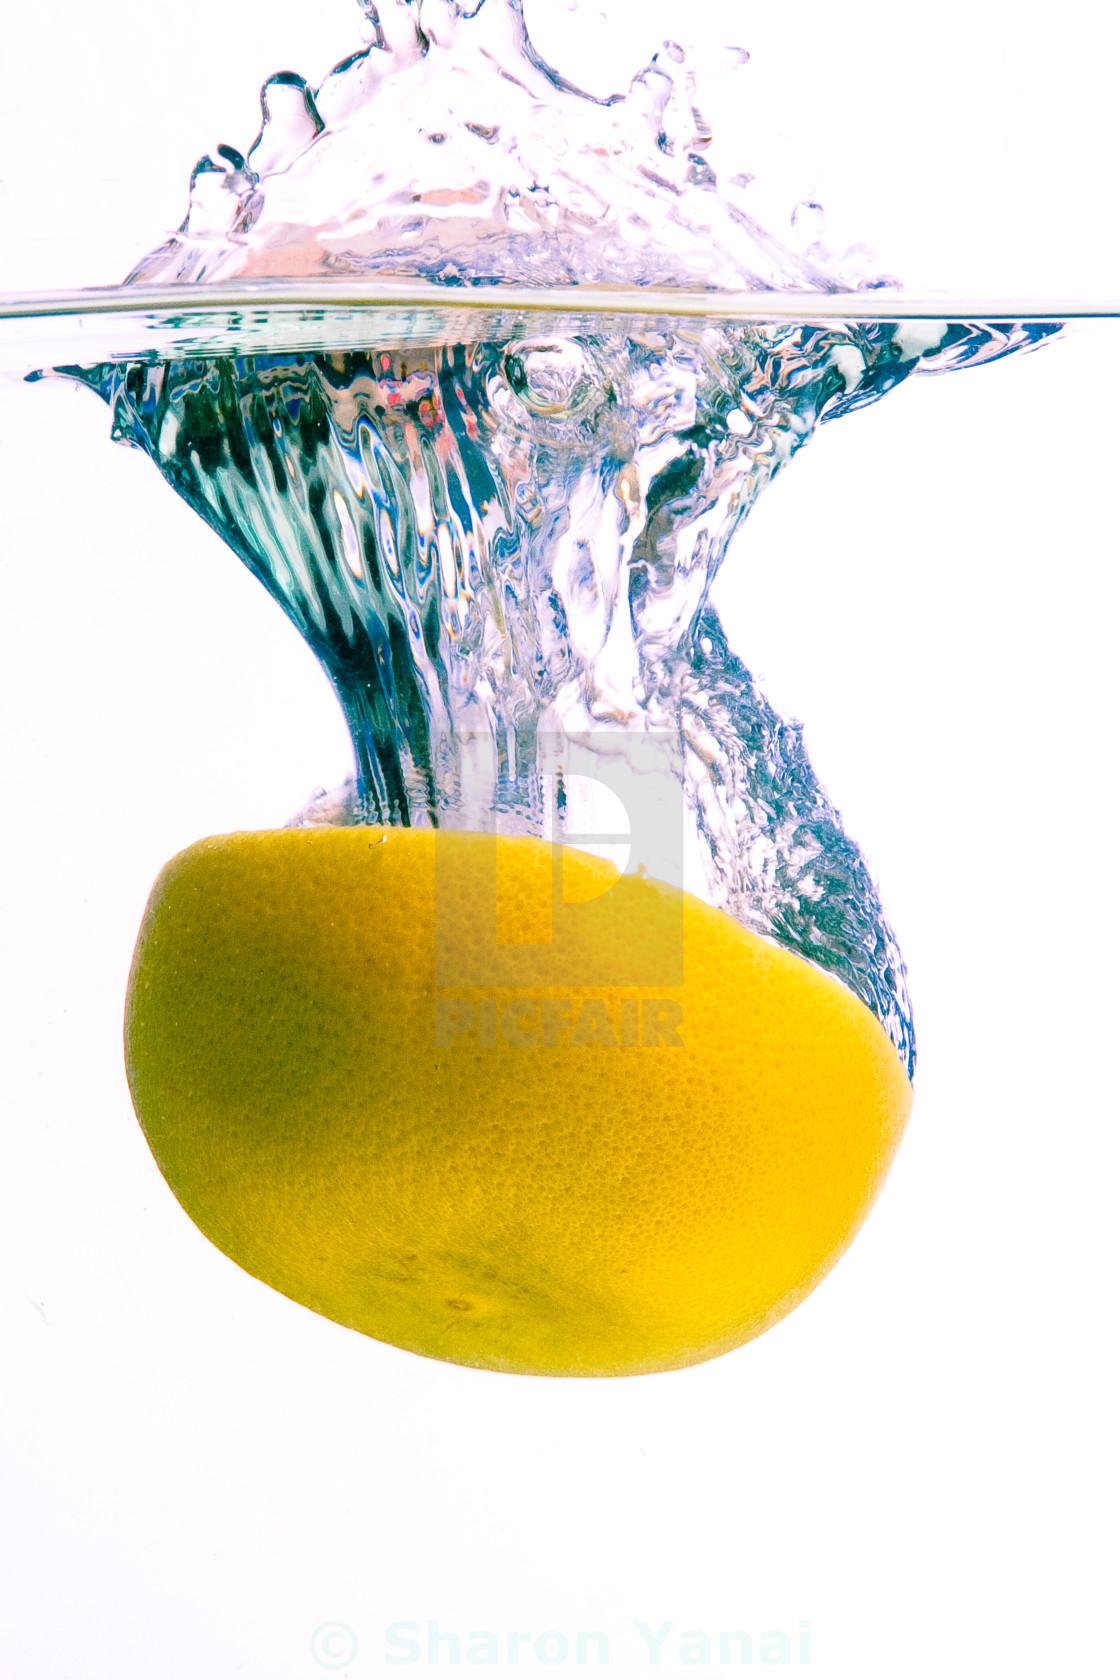 """Grapefruit falls into water with splash"" stock image"